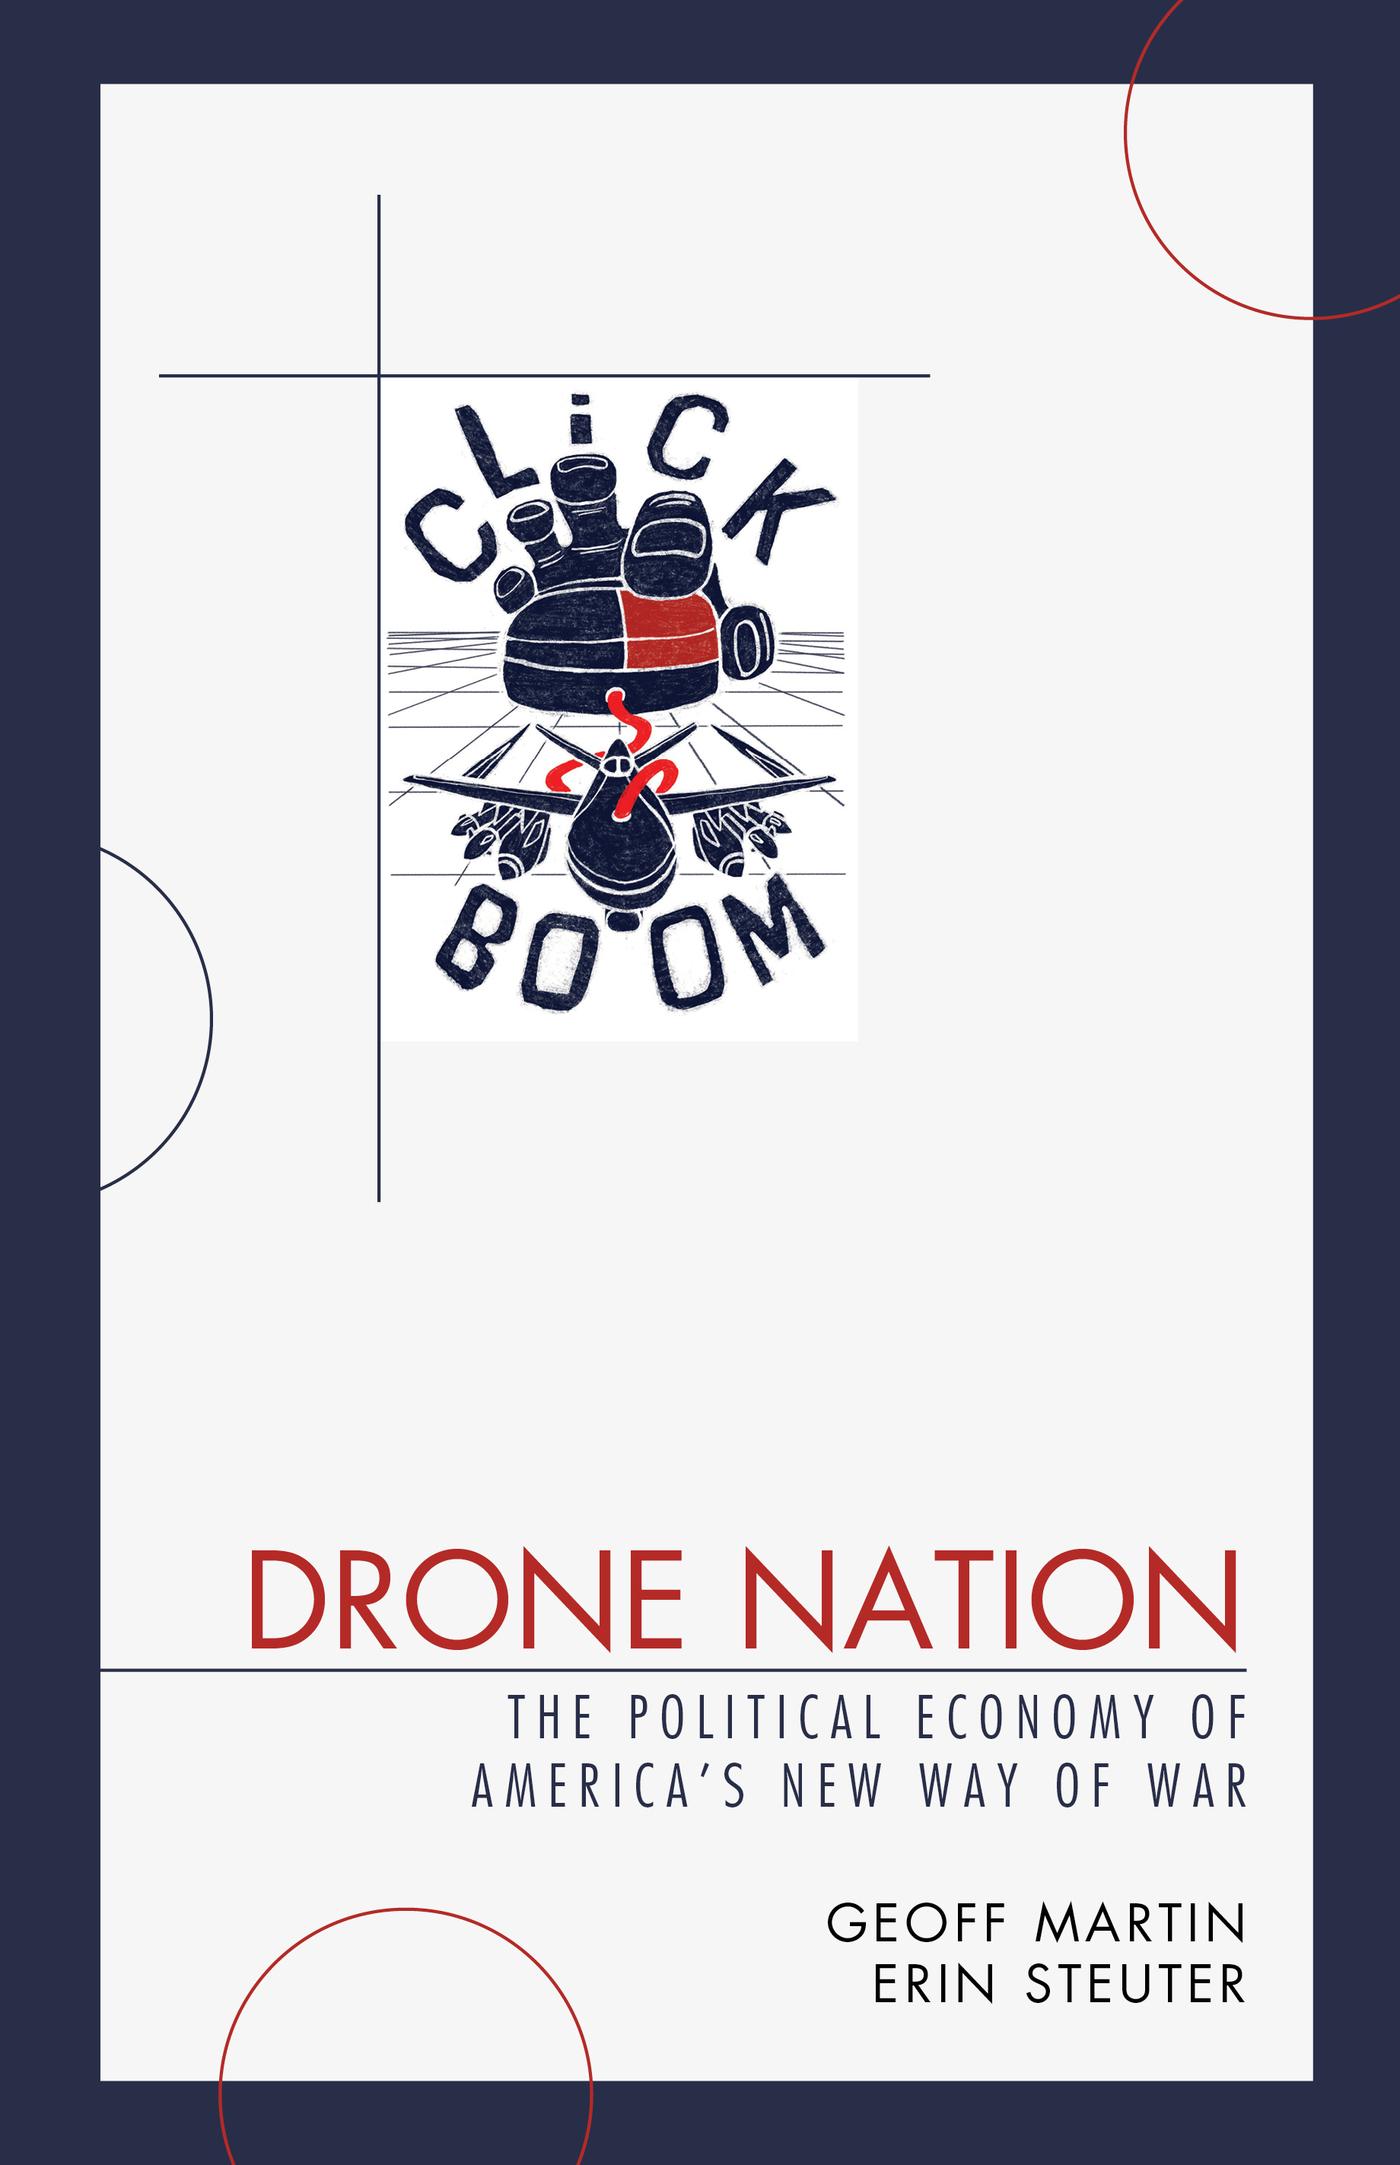 Ebook rental (120 days) #drone